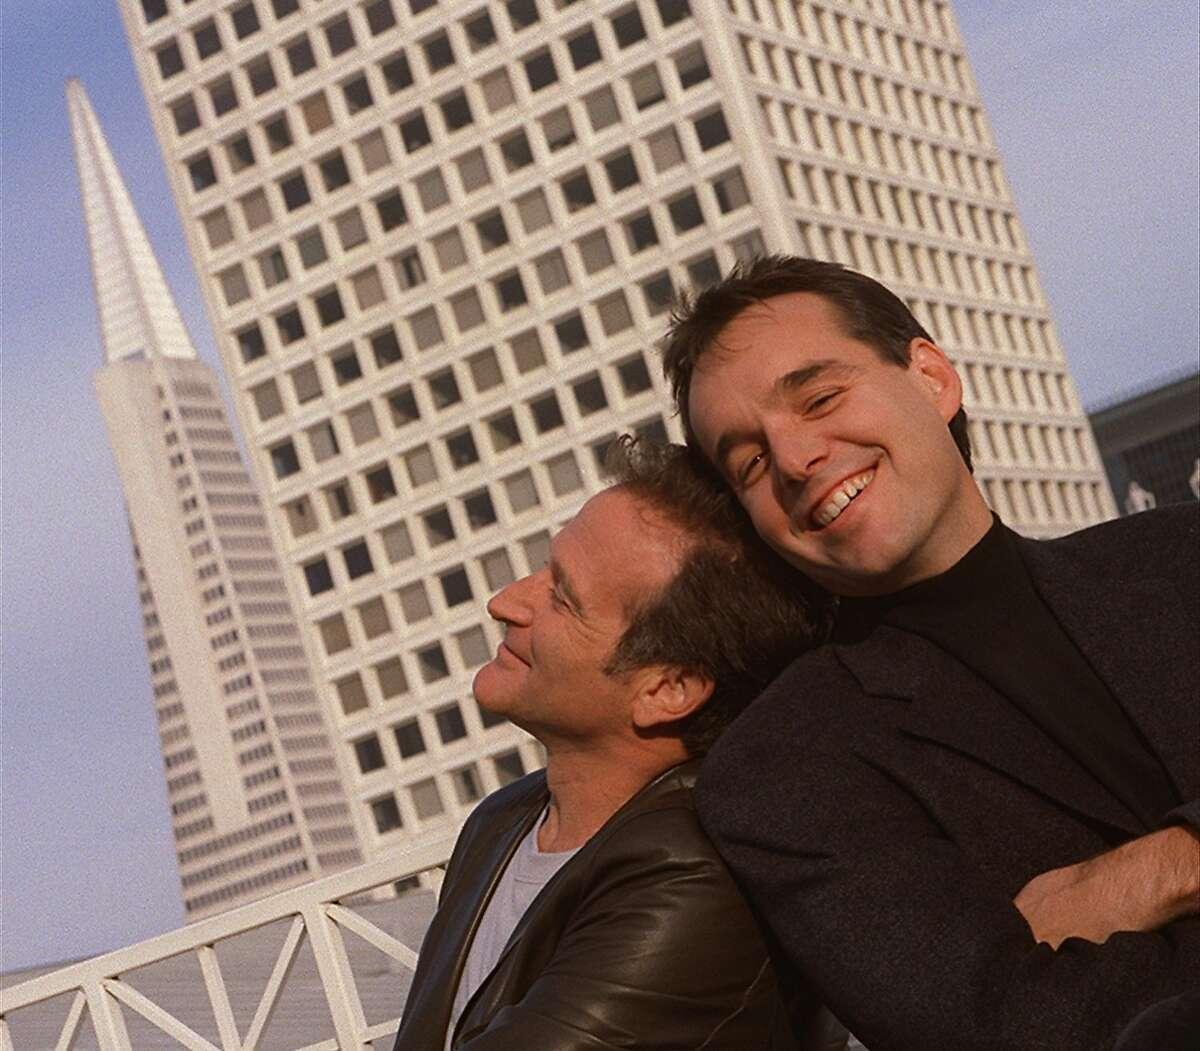 Robin Williams (left) and director Chris Columbus pose atop the Ritz-Carlton Hotel in San Francisco.